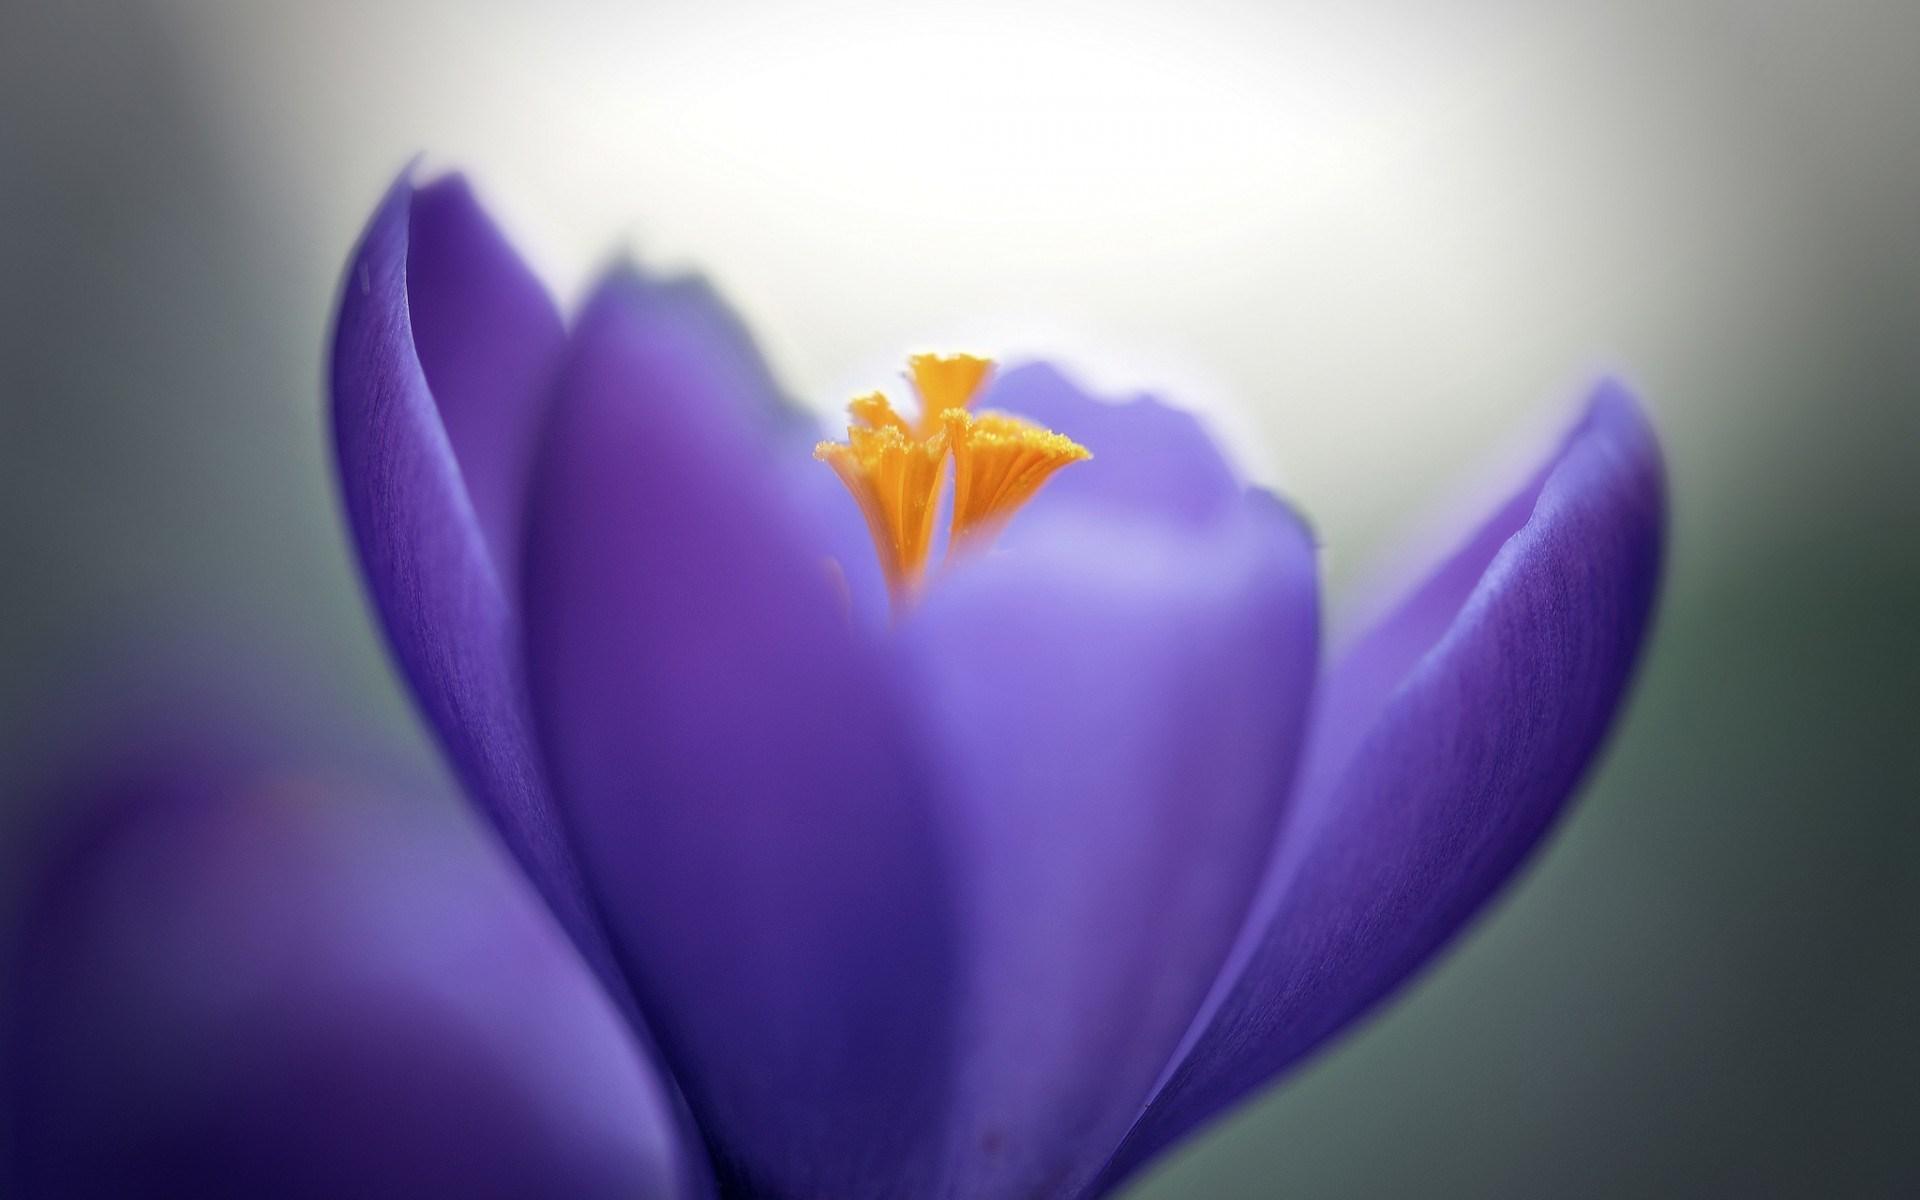 crocuses wallpaper lilac